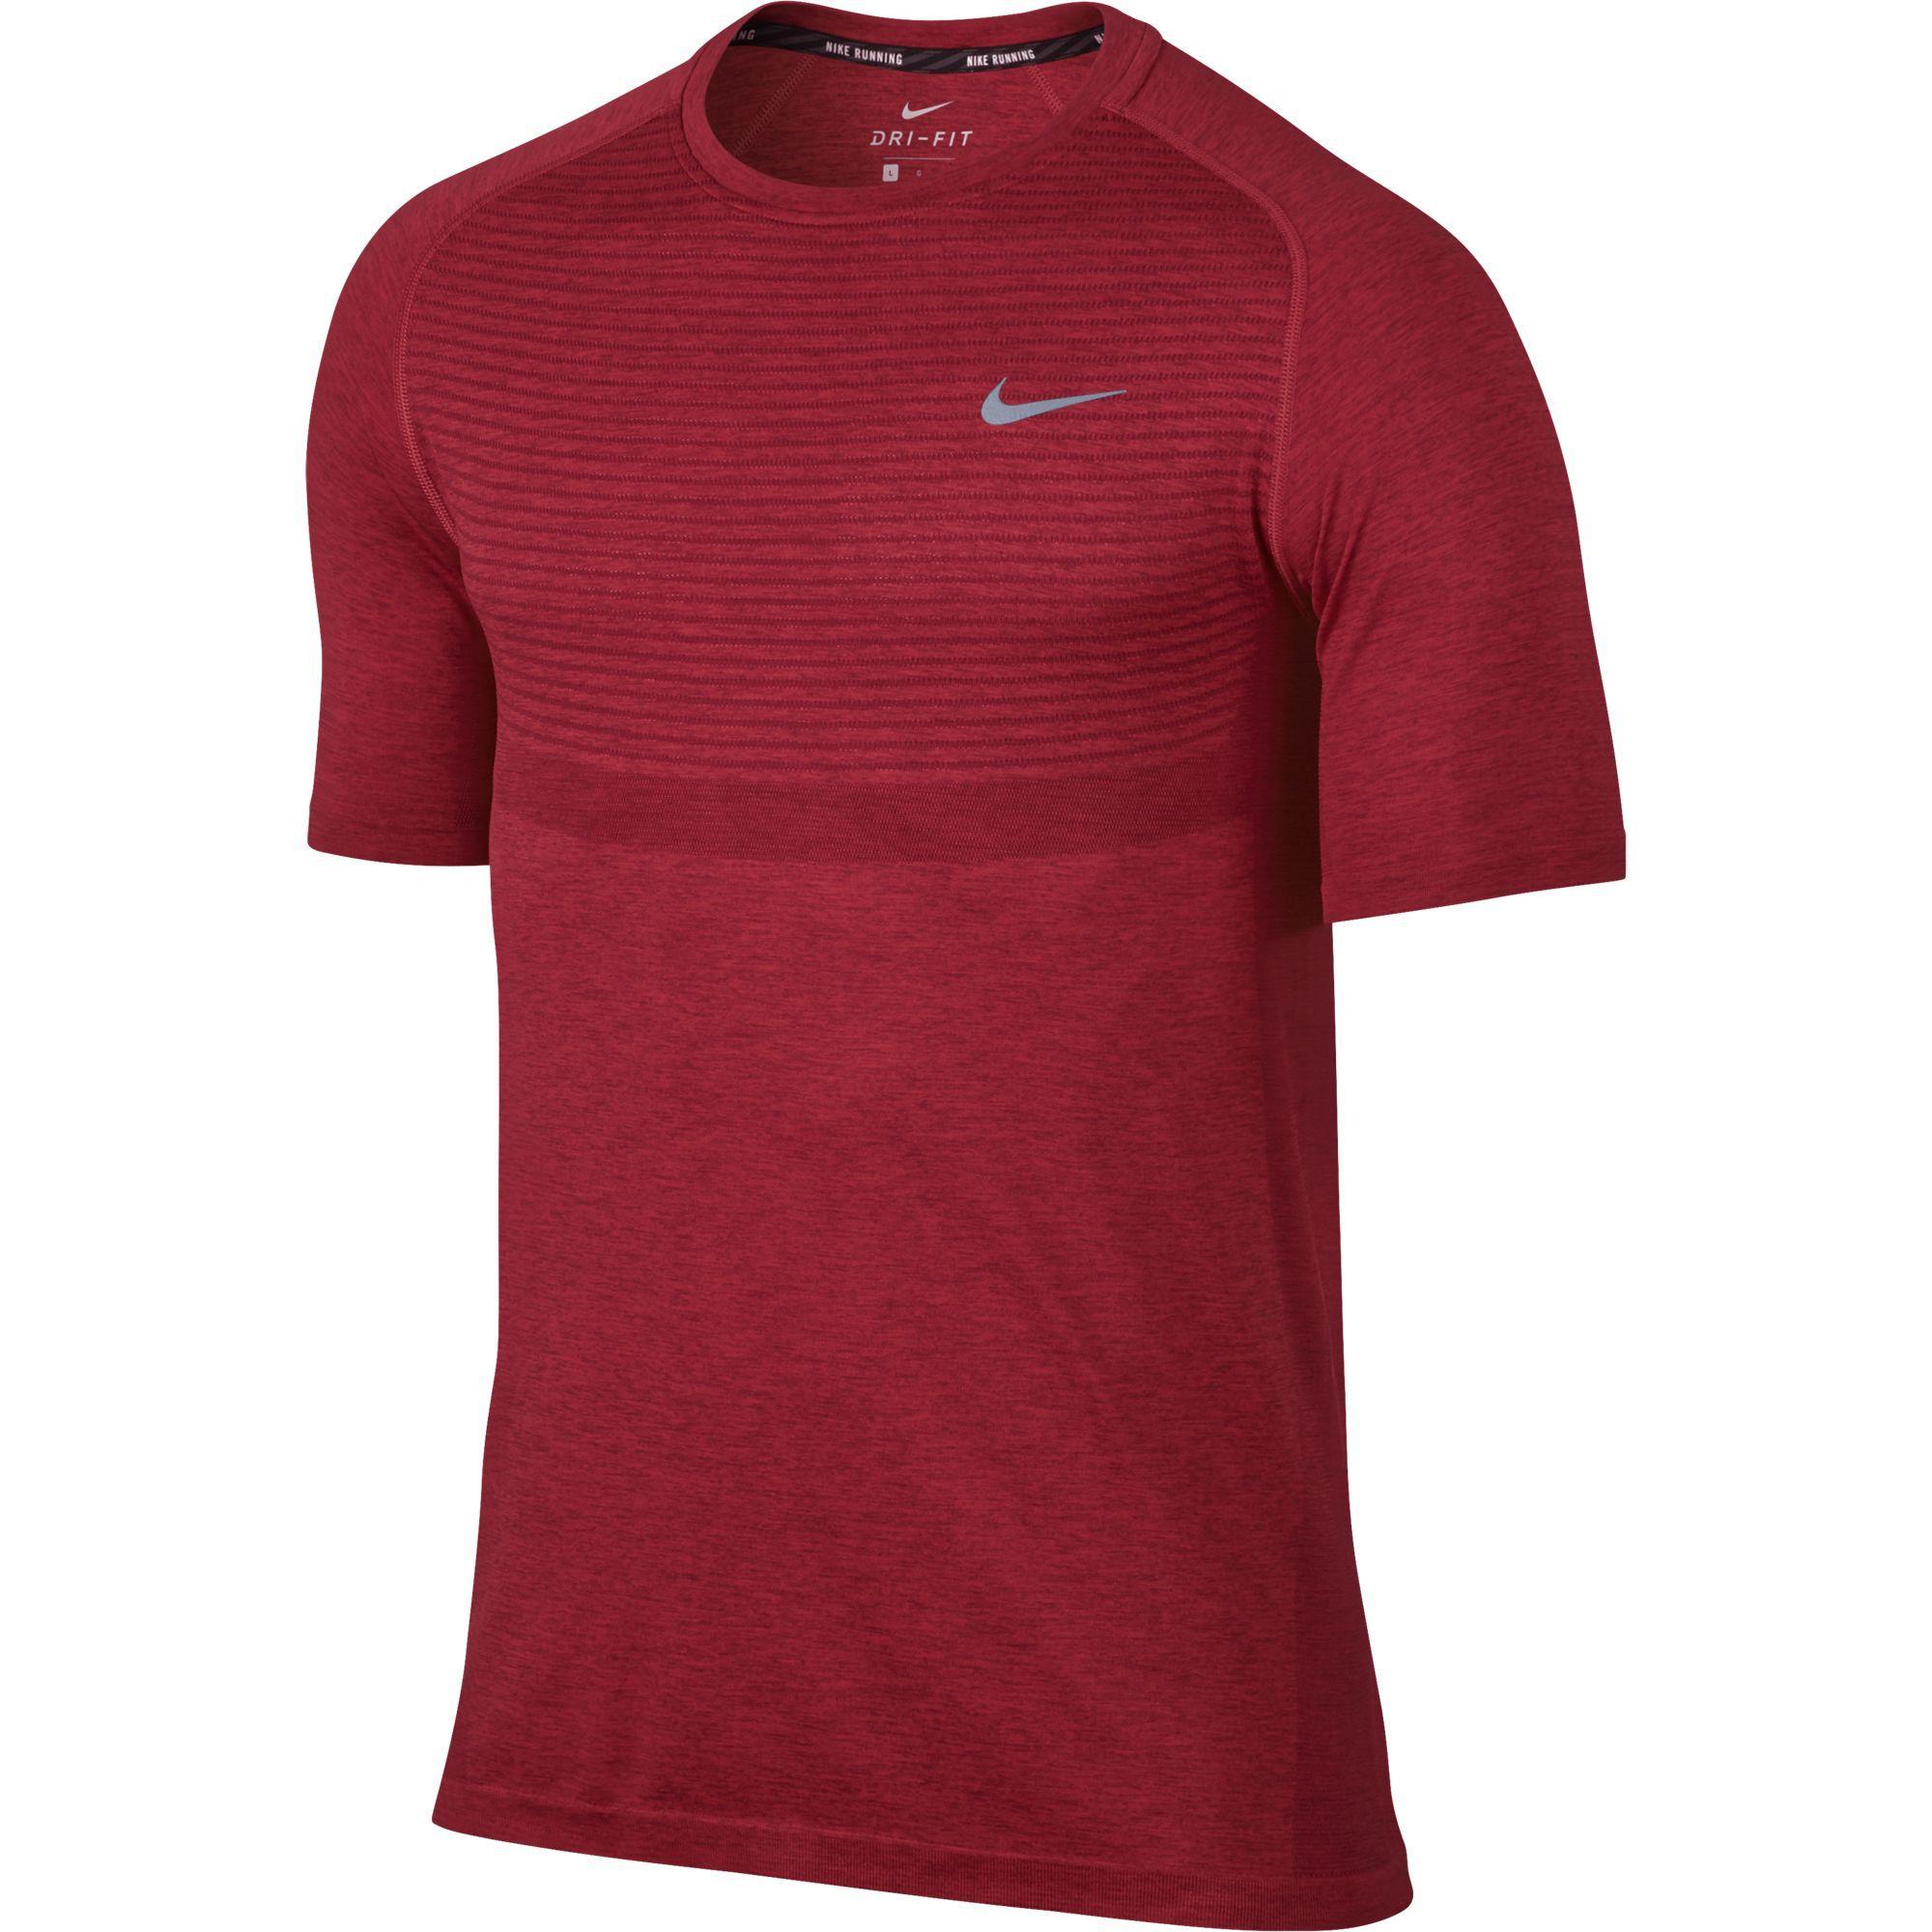 Nike Dri-FIT Knit Short Sleeve 67523